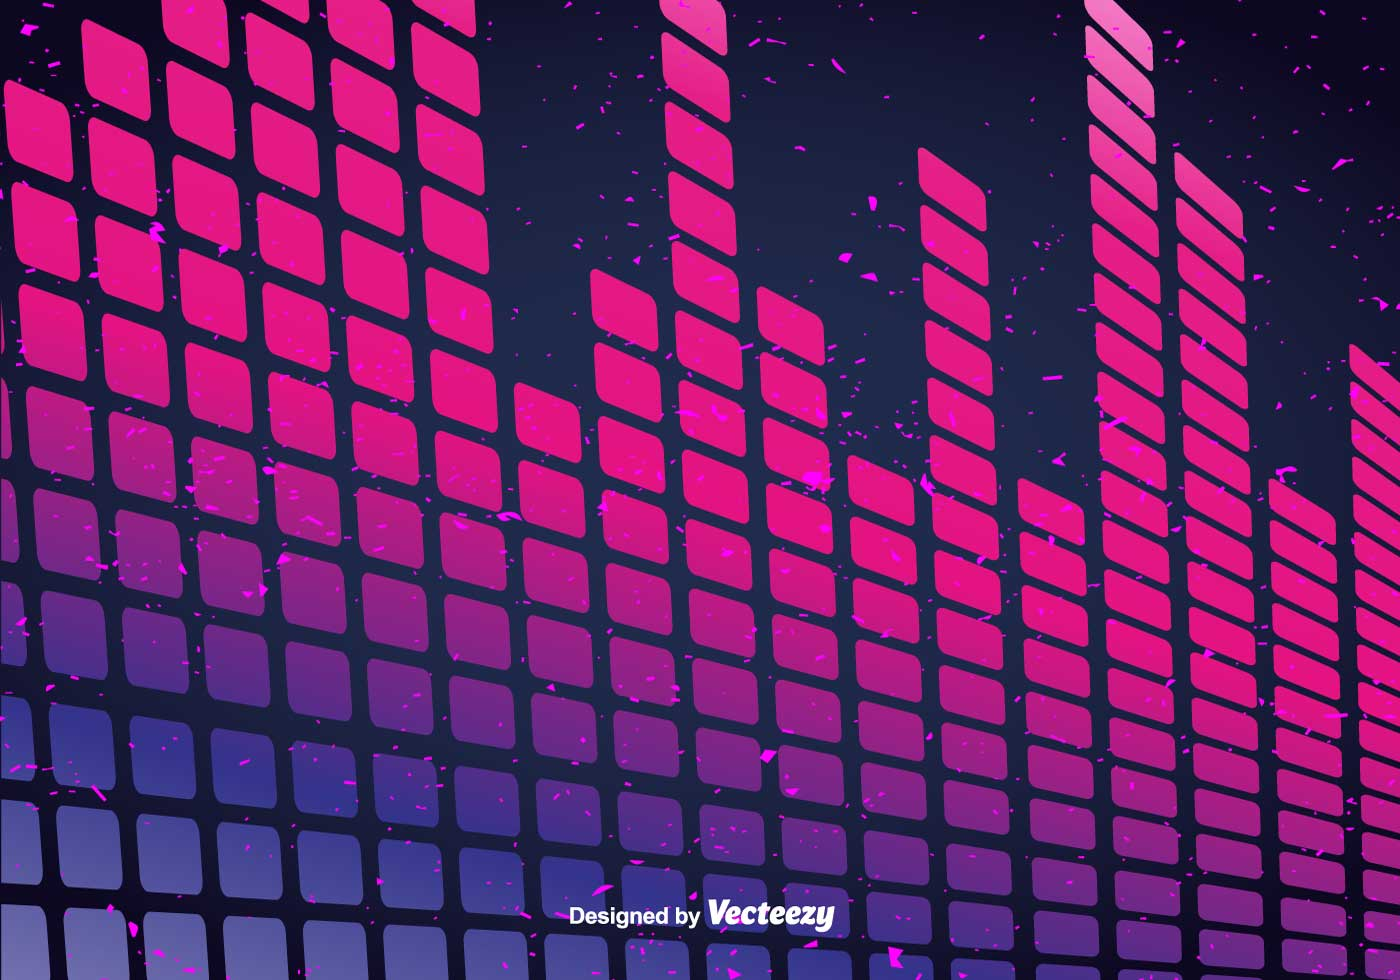 Vector Pink Sound Bars Background 144989 Download Free Vectors Clipart Graphics Vector Art